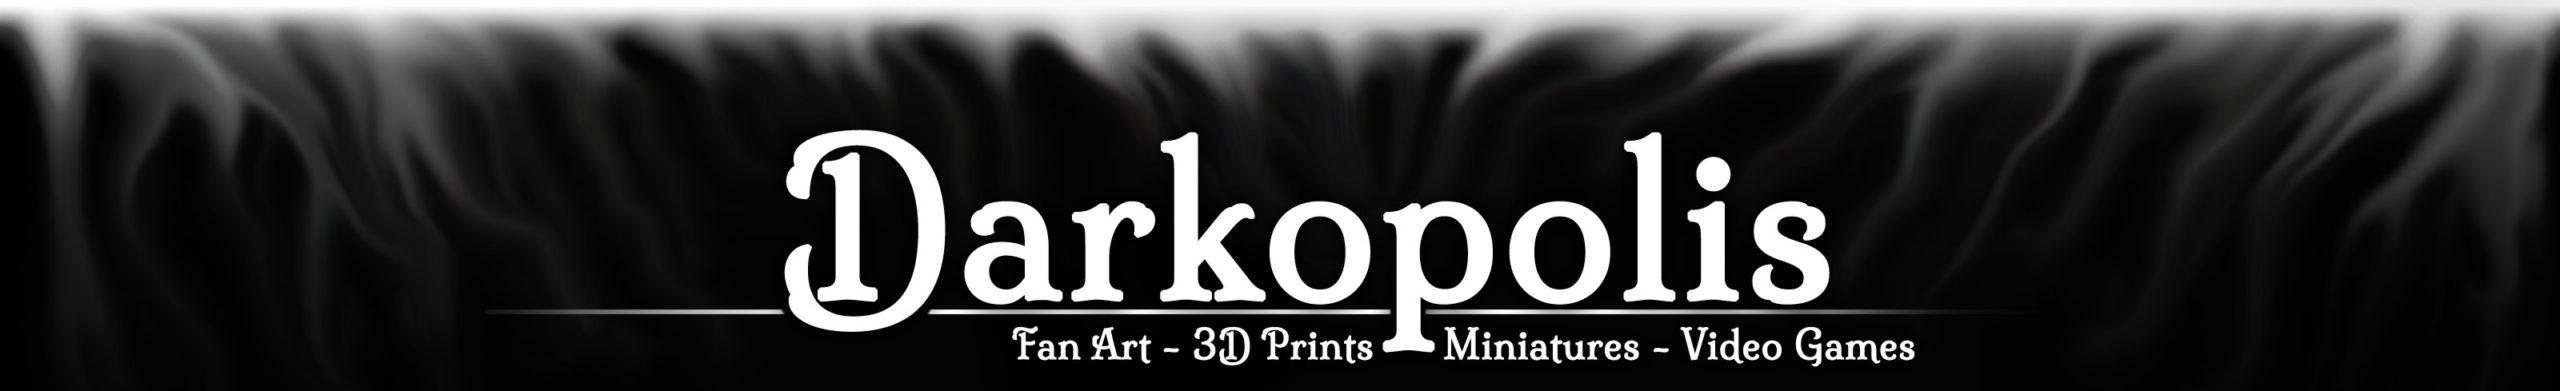 Darkopolis